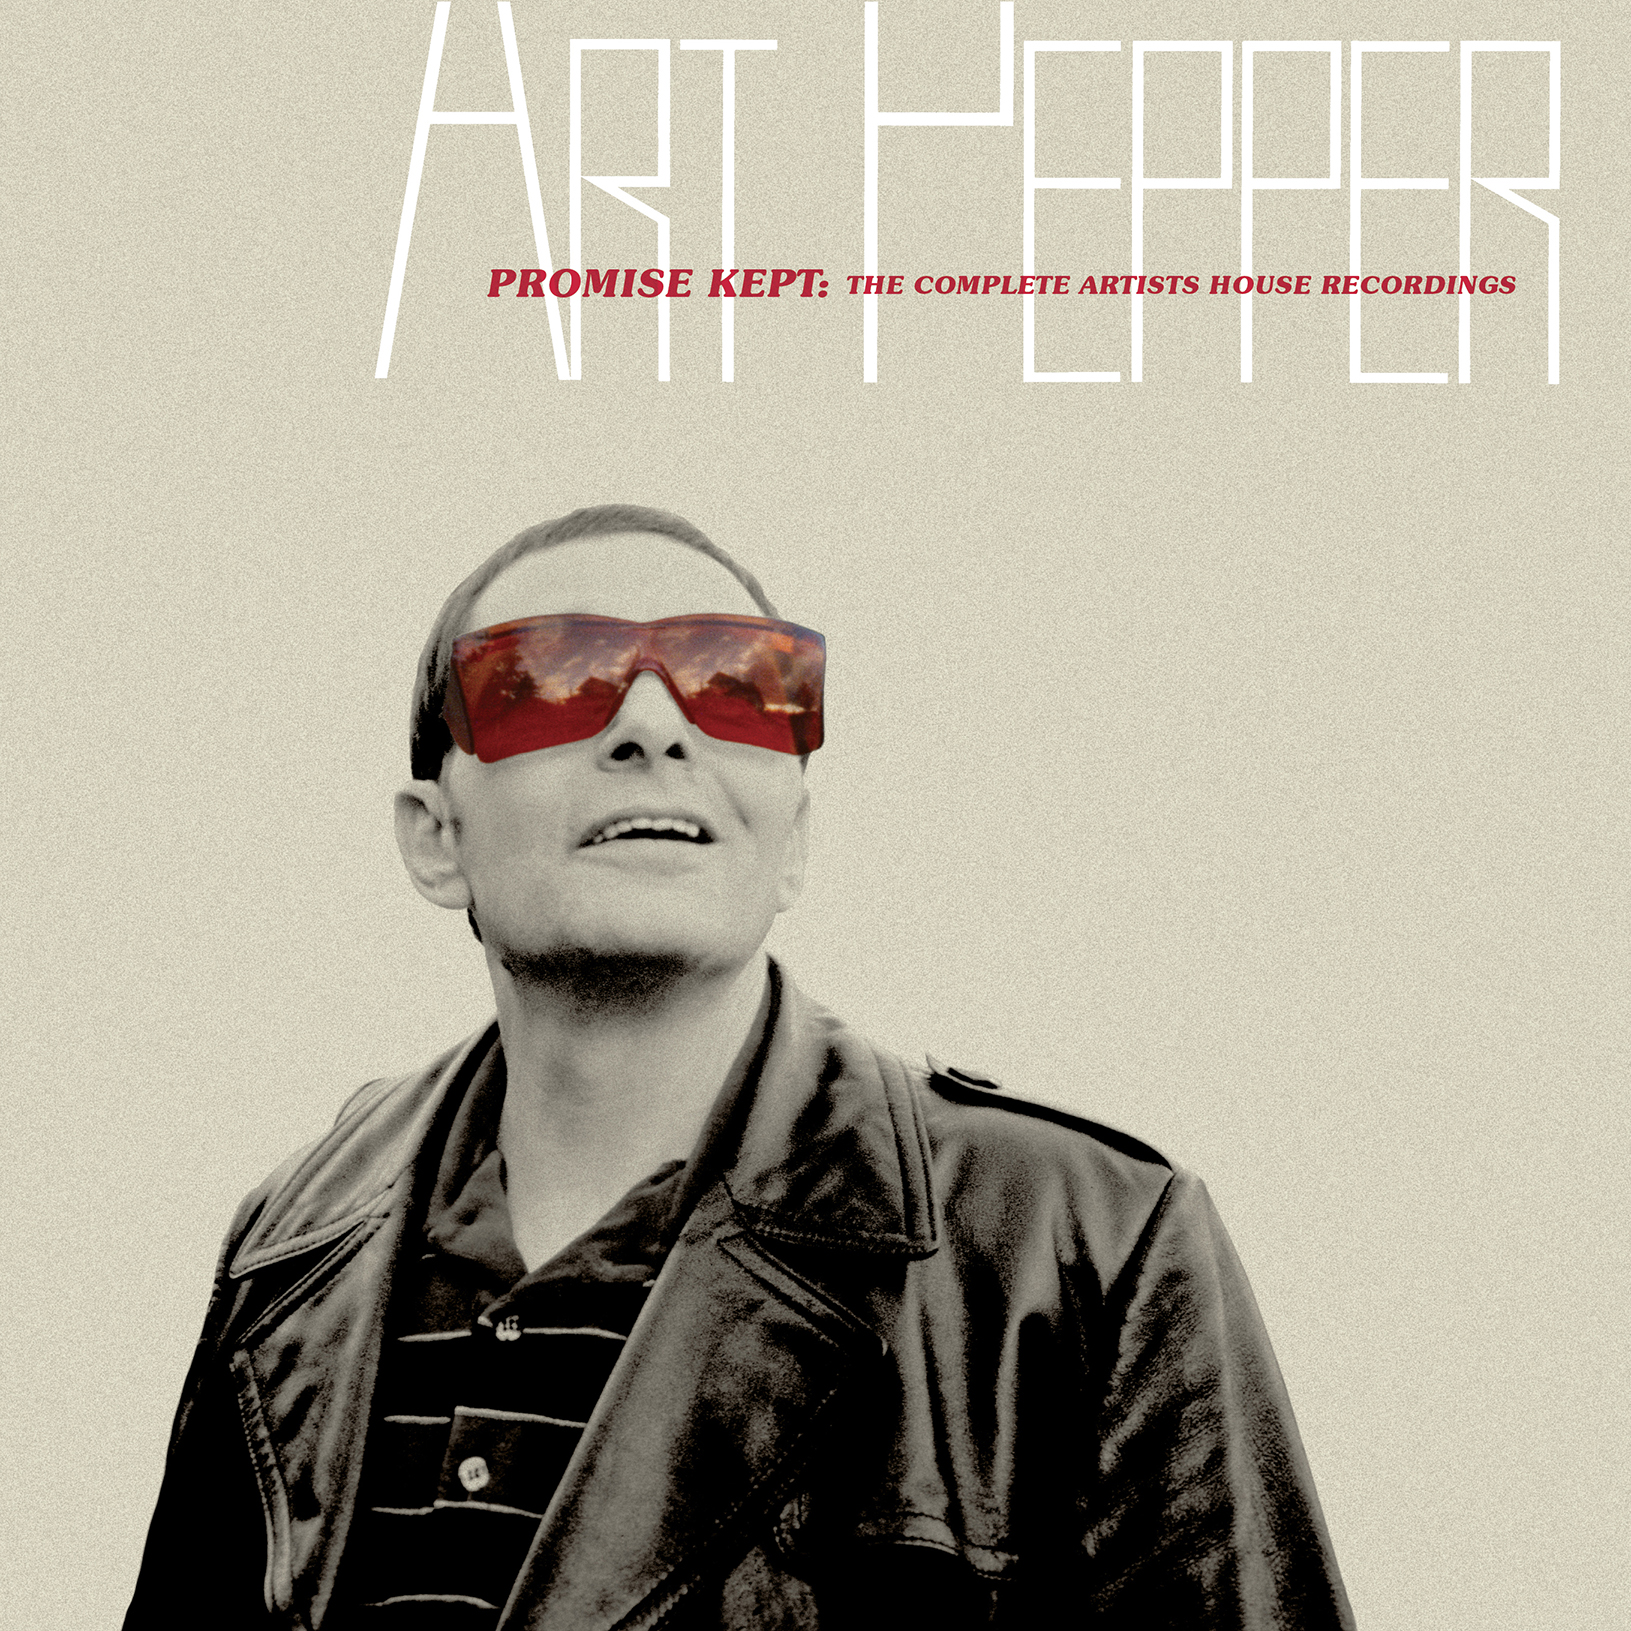 Art Pepper - Promise Kept: The Complete Artists House Recordings  Release Date: September 13, 2019 Label: Omnivore Recordings  SERVICE: Mastering, Restoration NUMBER OF DISCS: 6 GENRE: Jazz FORMAT: CD